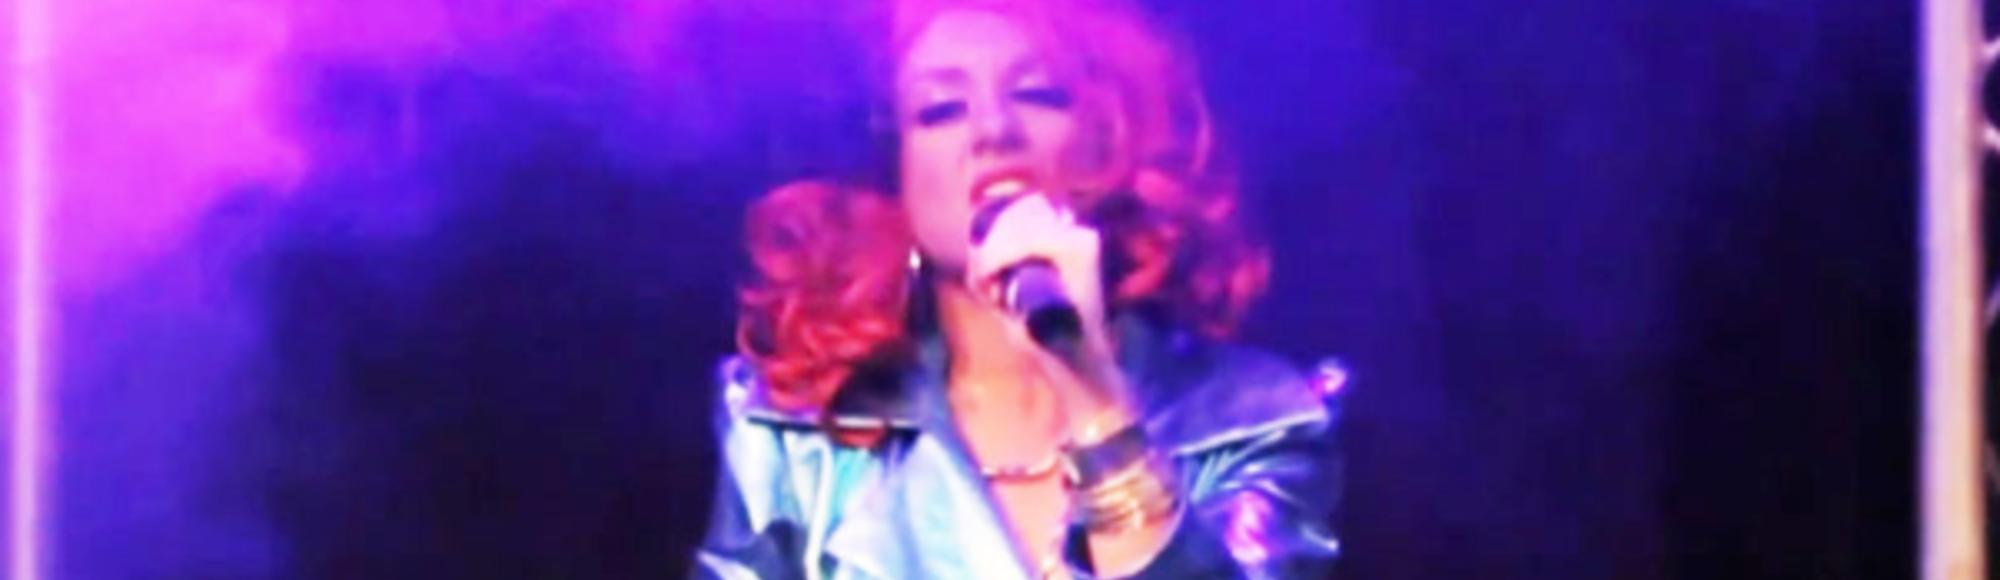 White Rihanna Impersonator vs. Billie JD Porter